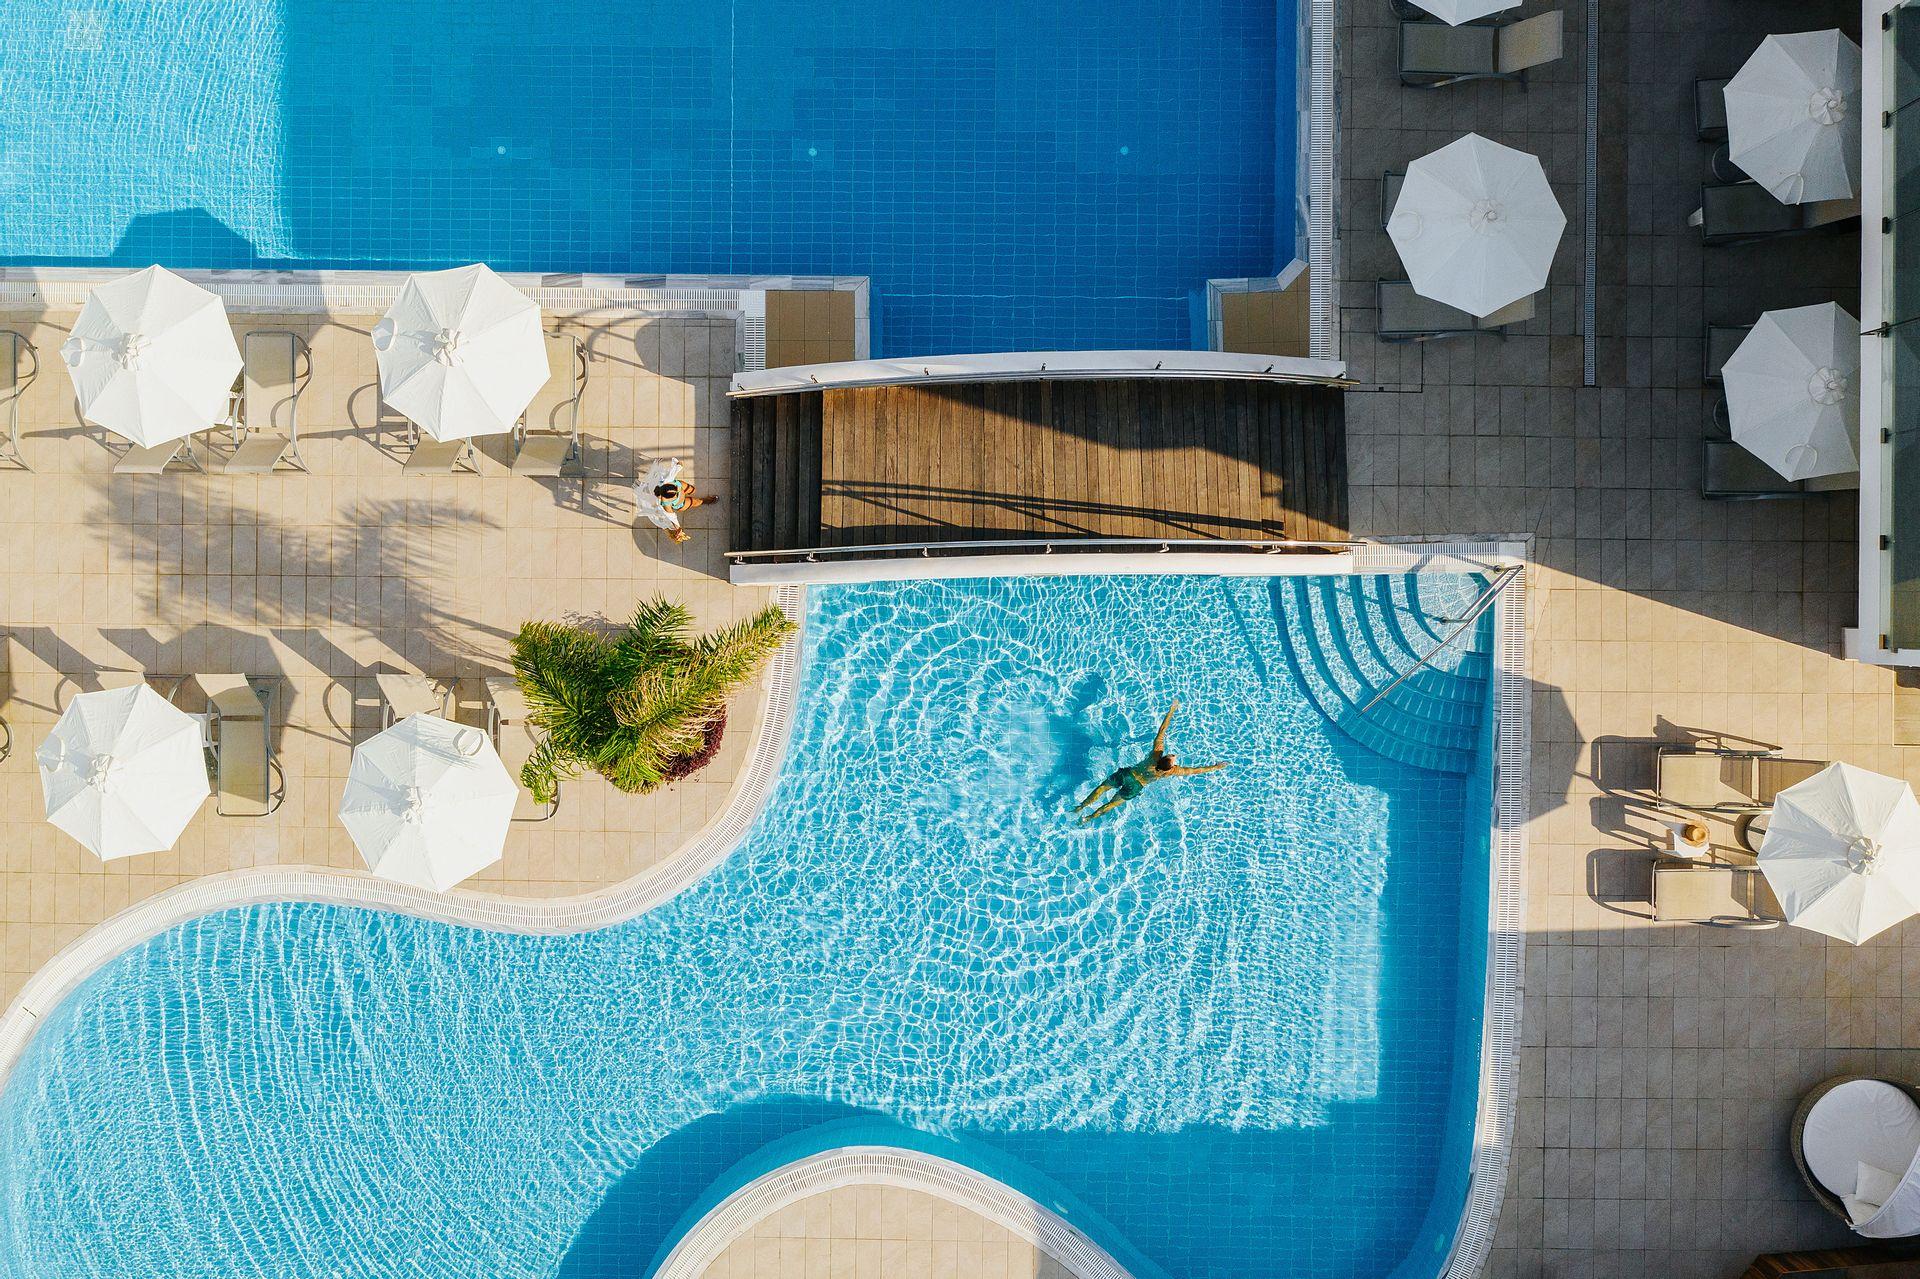 4* Sofianna Resort & Spa - Πάφος, Κύπρος ✦ 2 Ημέρες